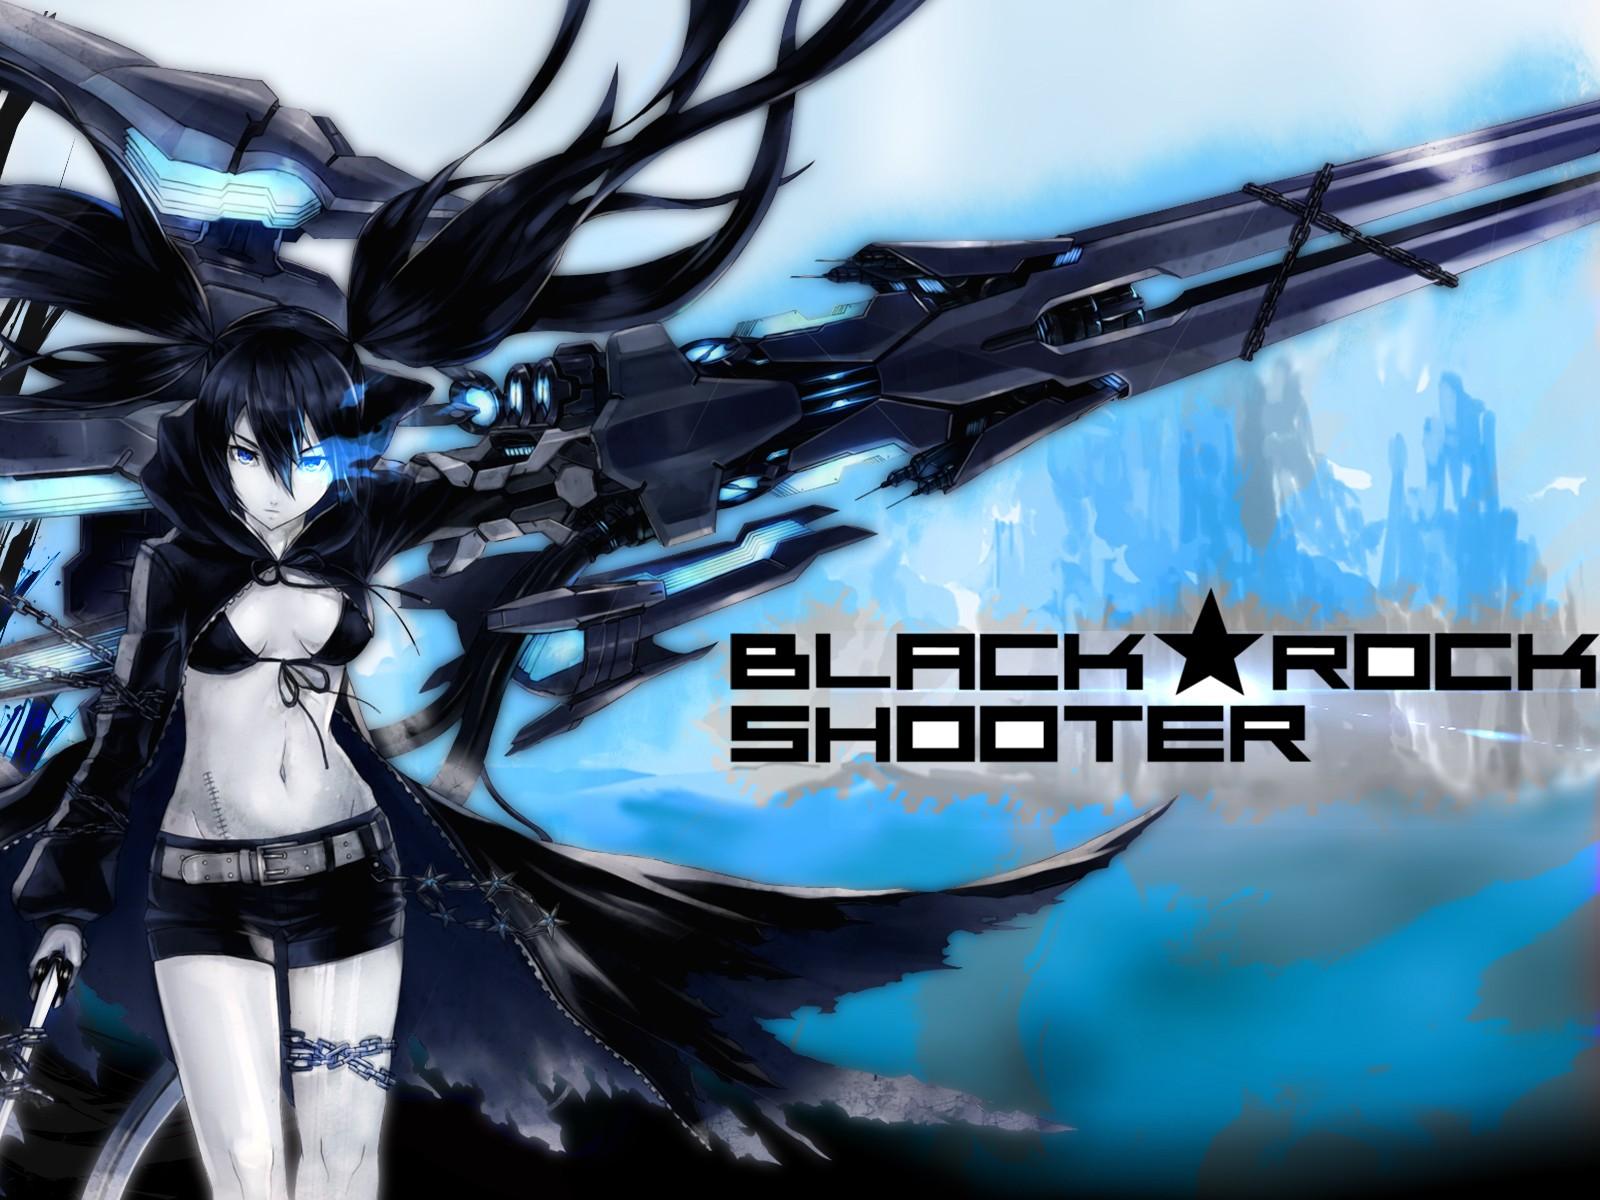 Unduh 600+ Wallpaper Black Rock Shooter HD